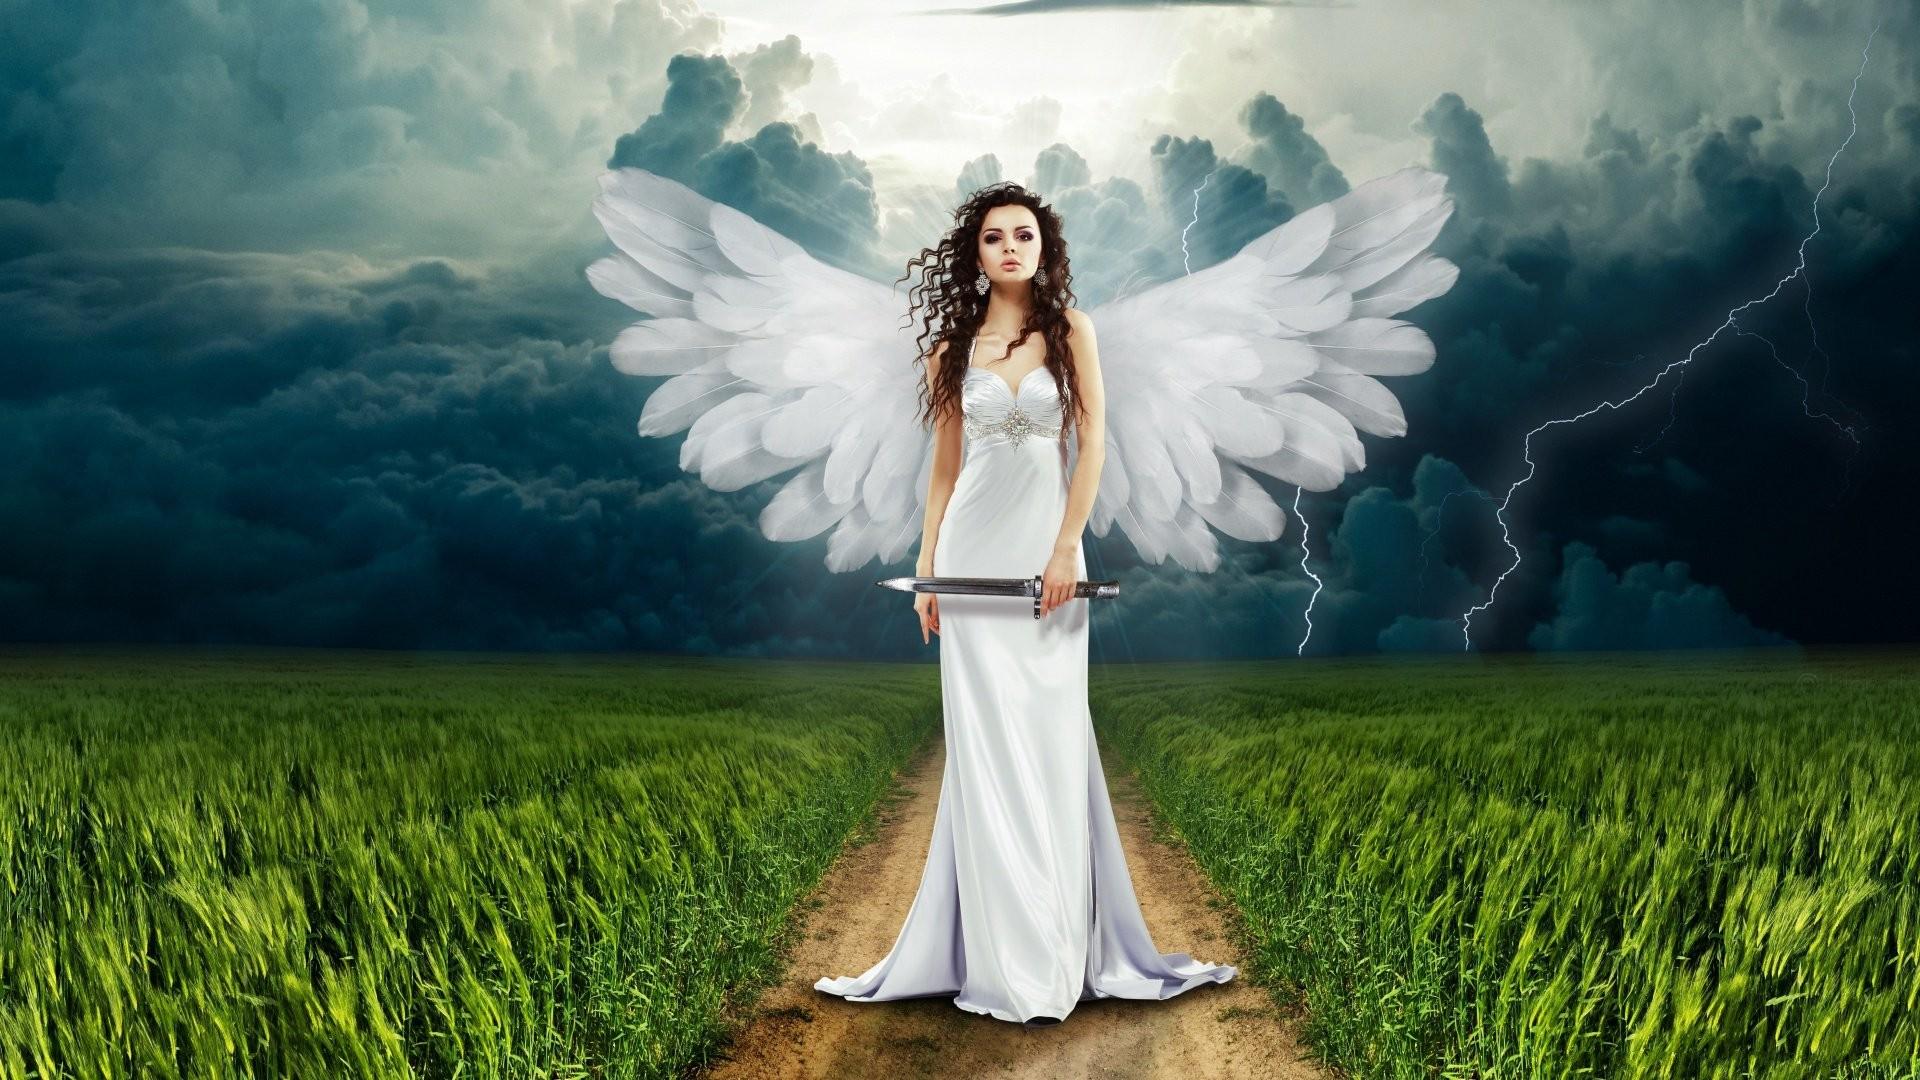 Imagenes angeles mujeres fotos